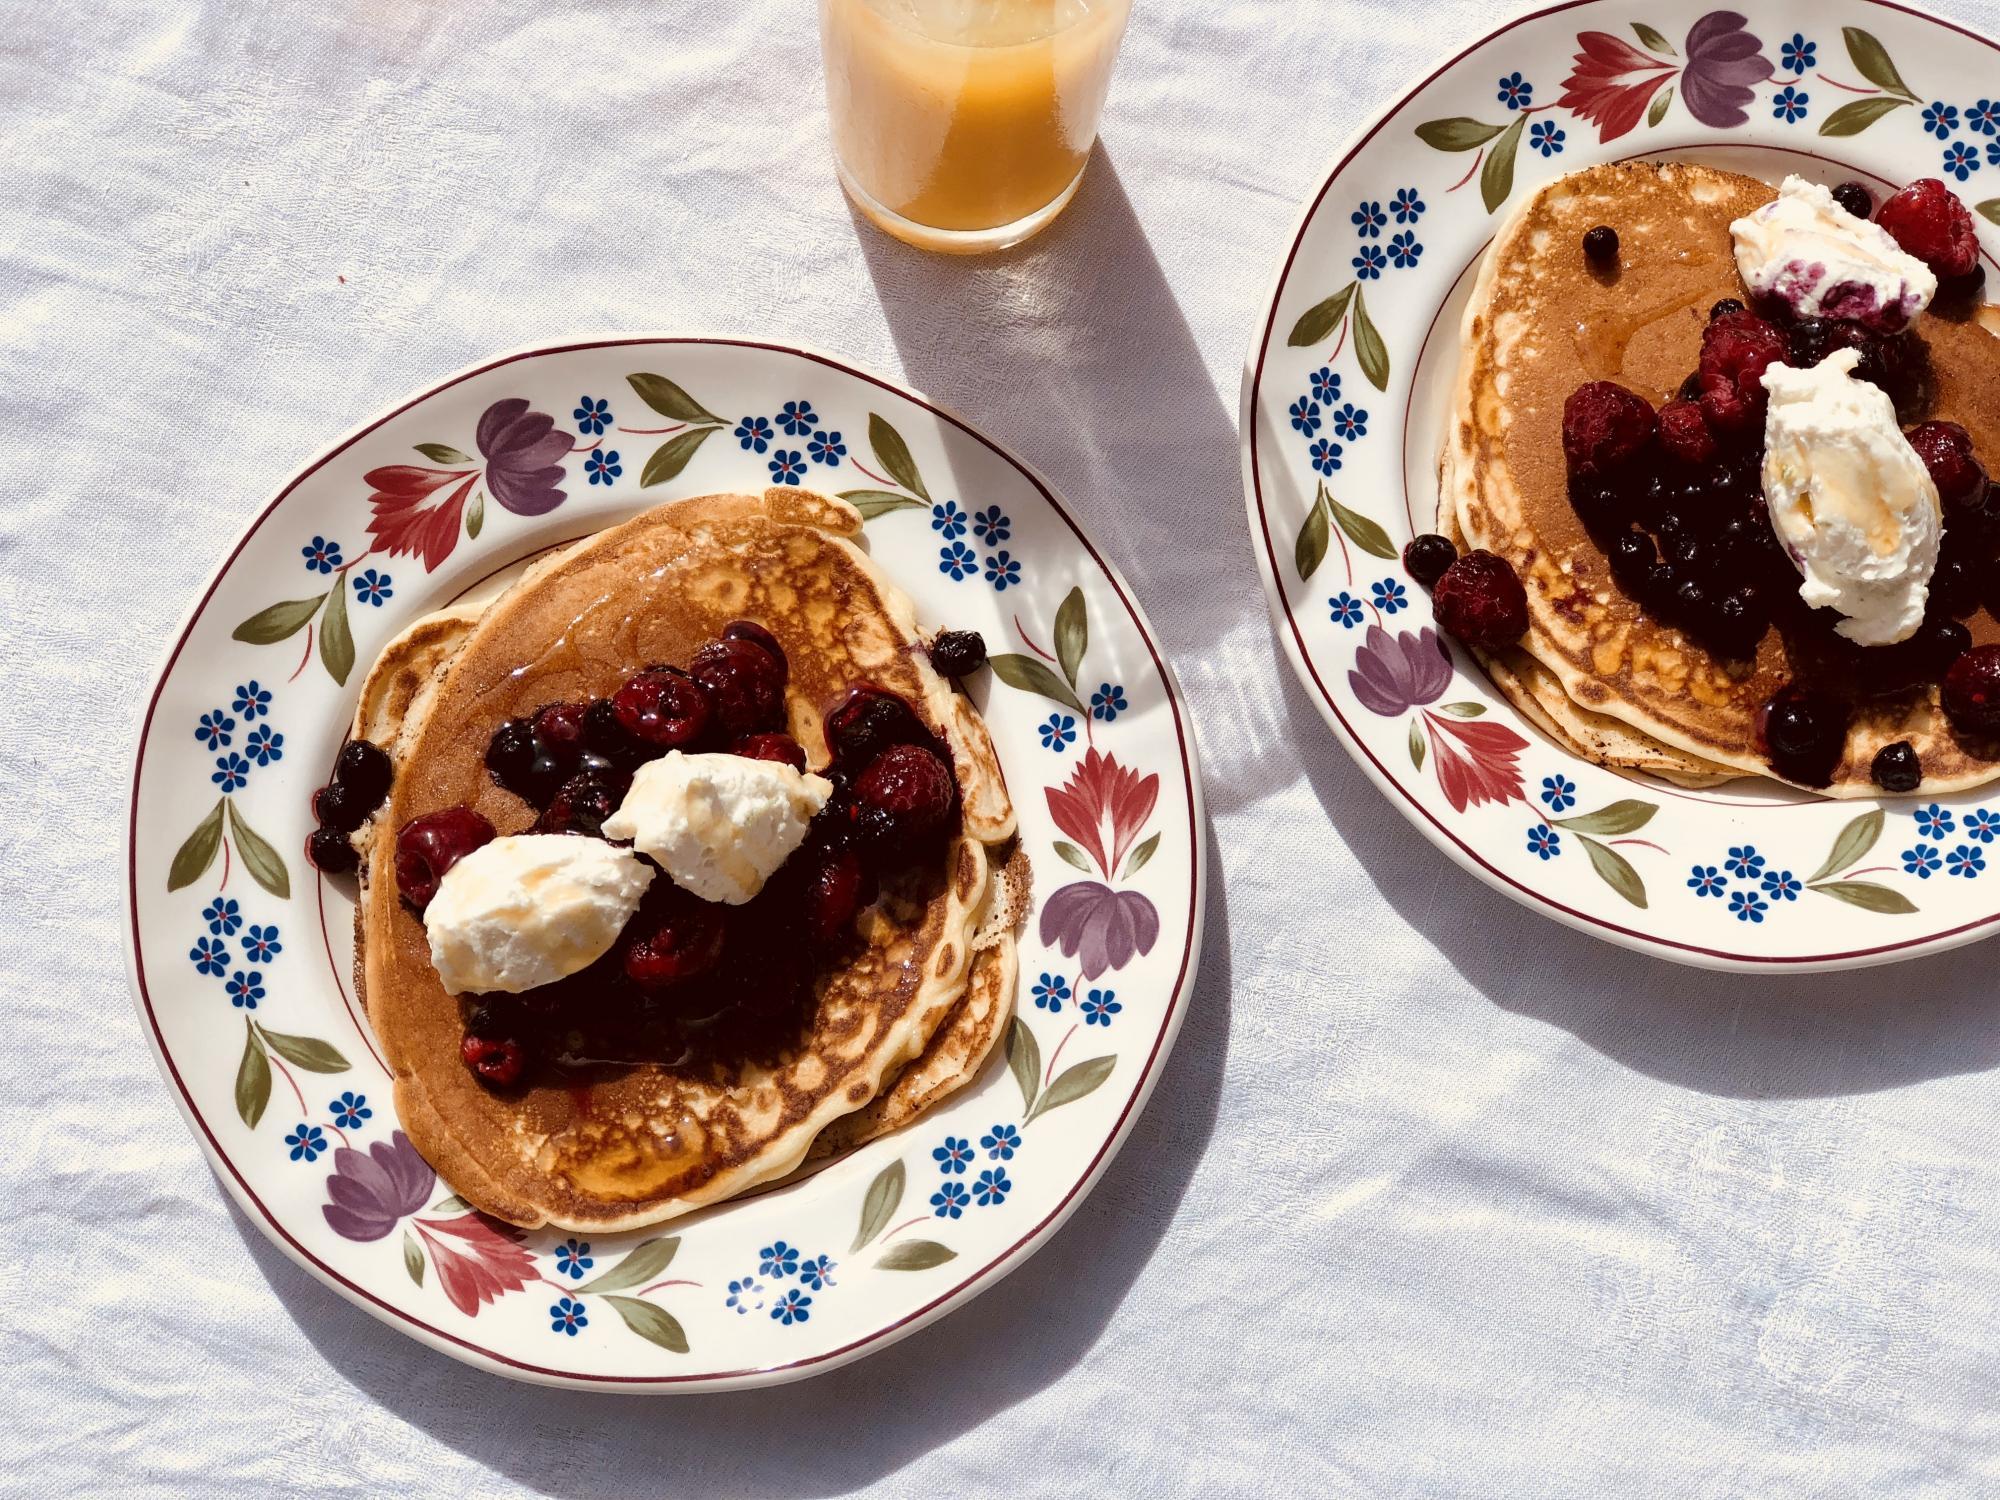 Recept | Ricotta & mascarpone pannkakor